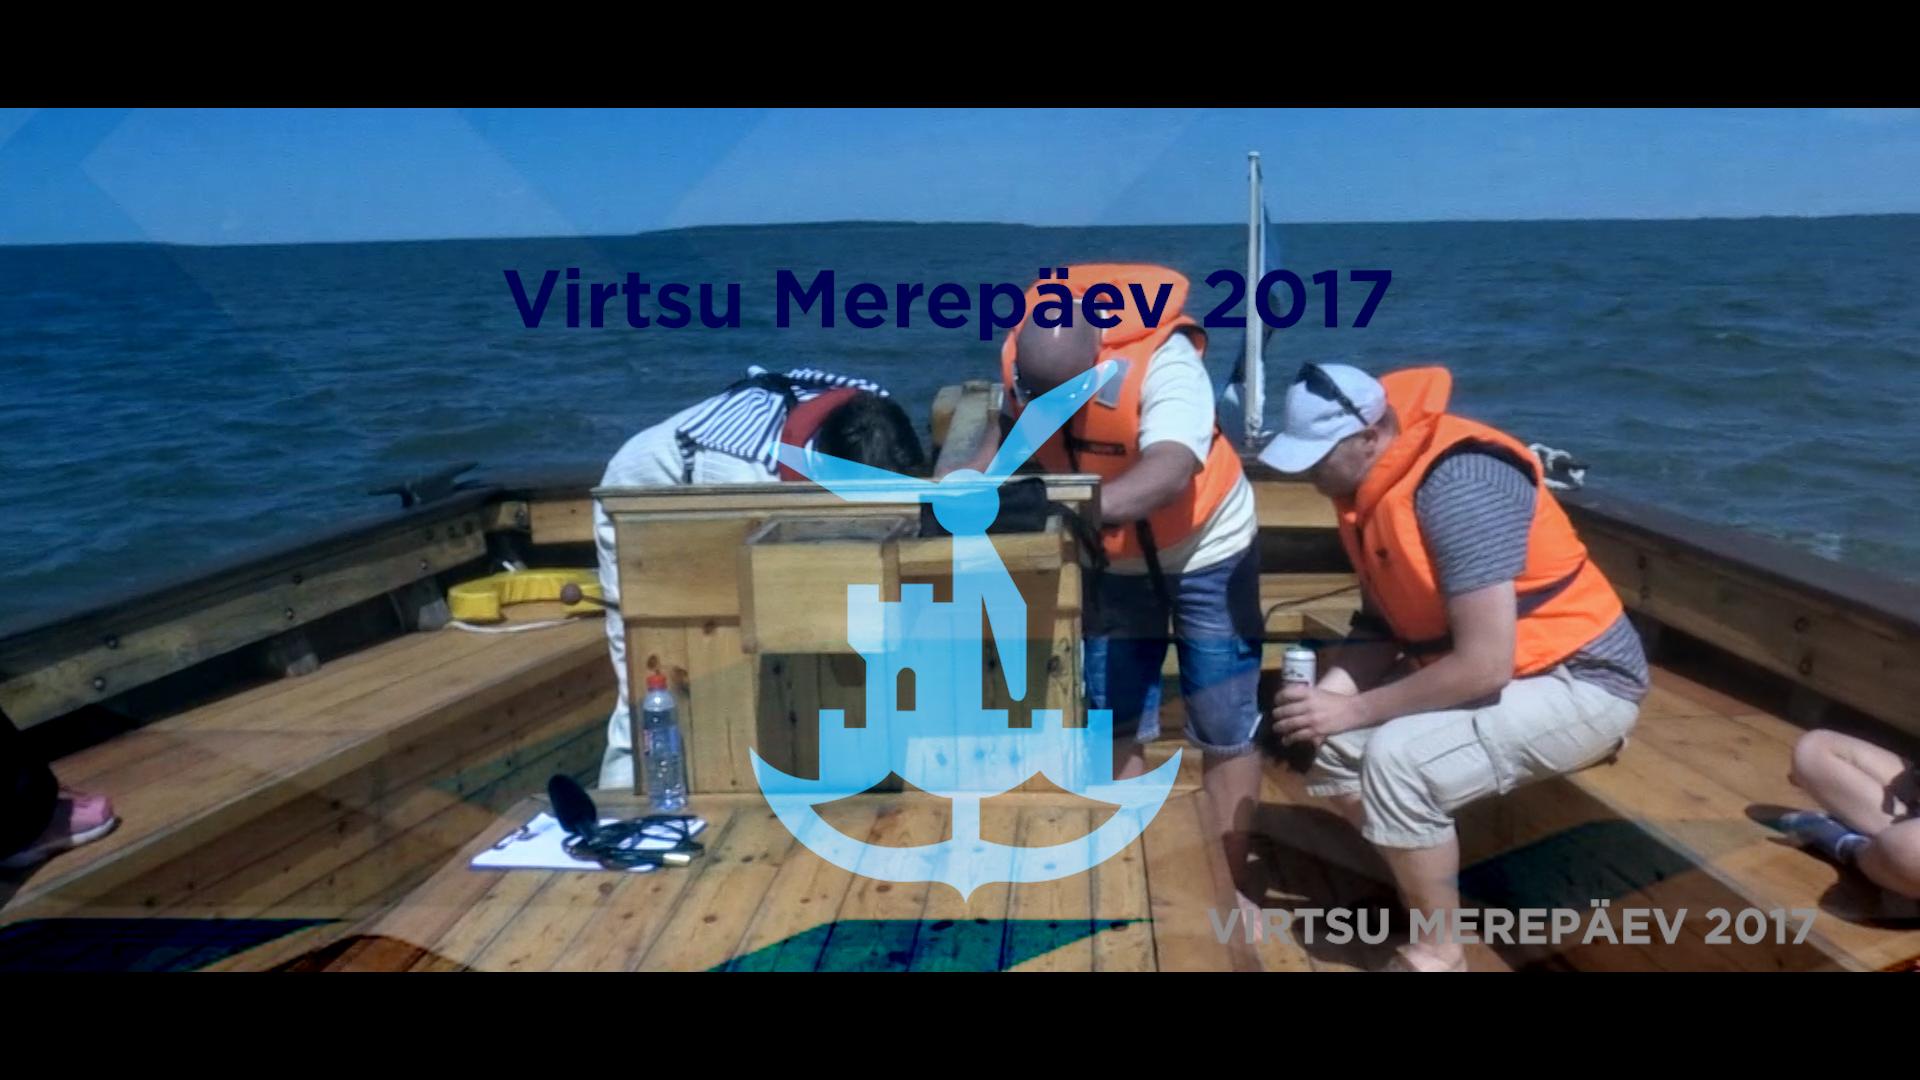 Virtsu Merepäev 2017 aftermovie